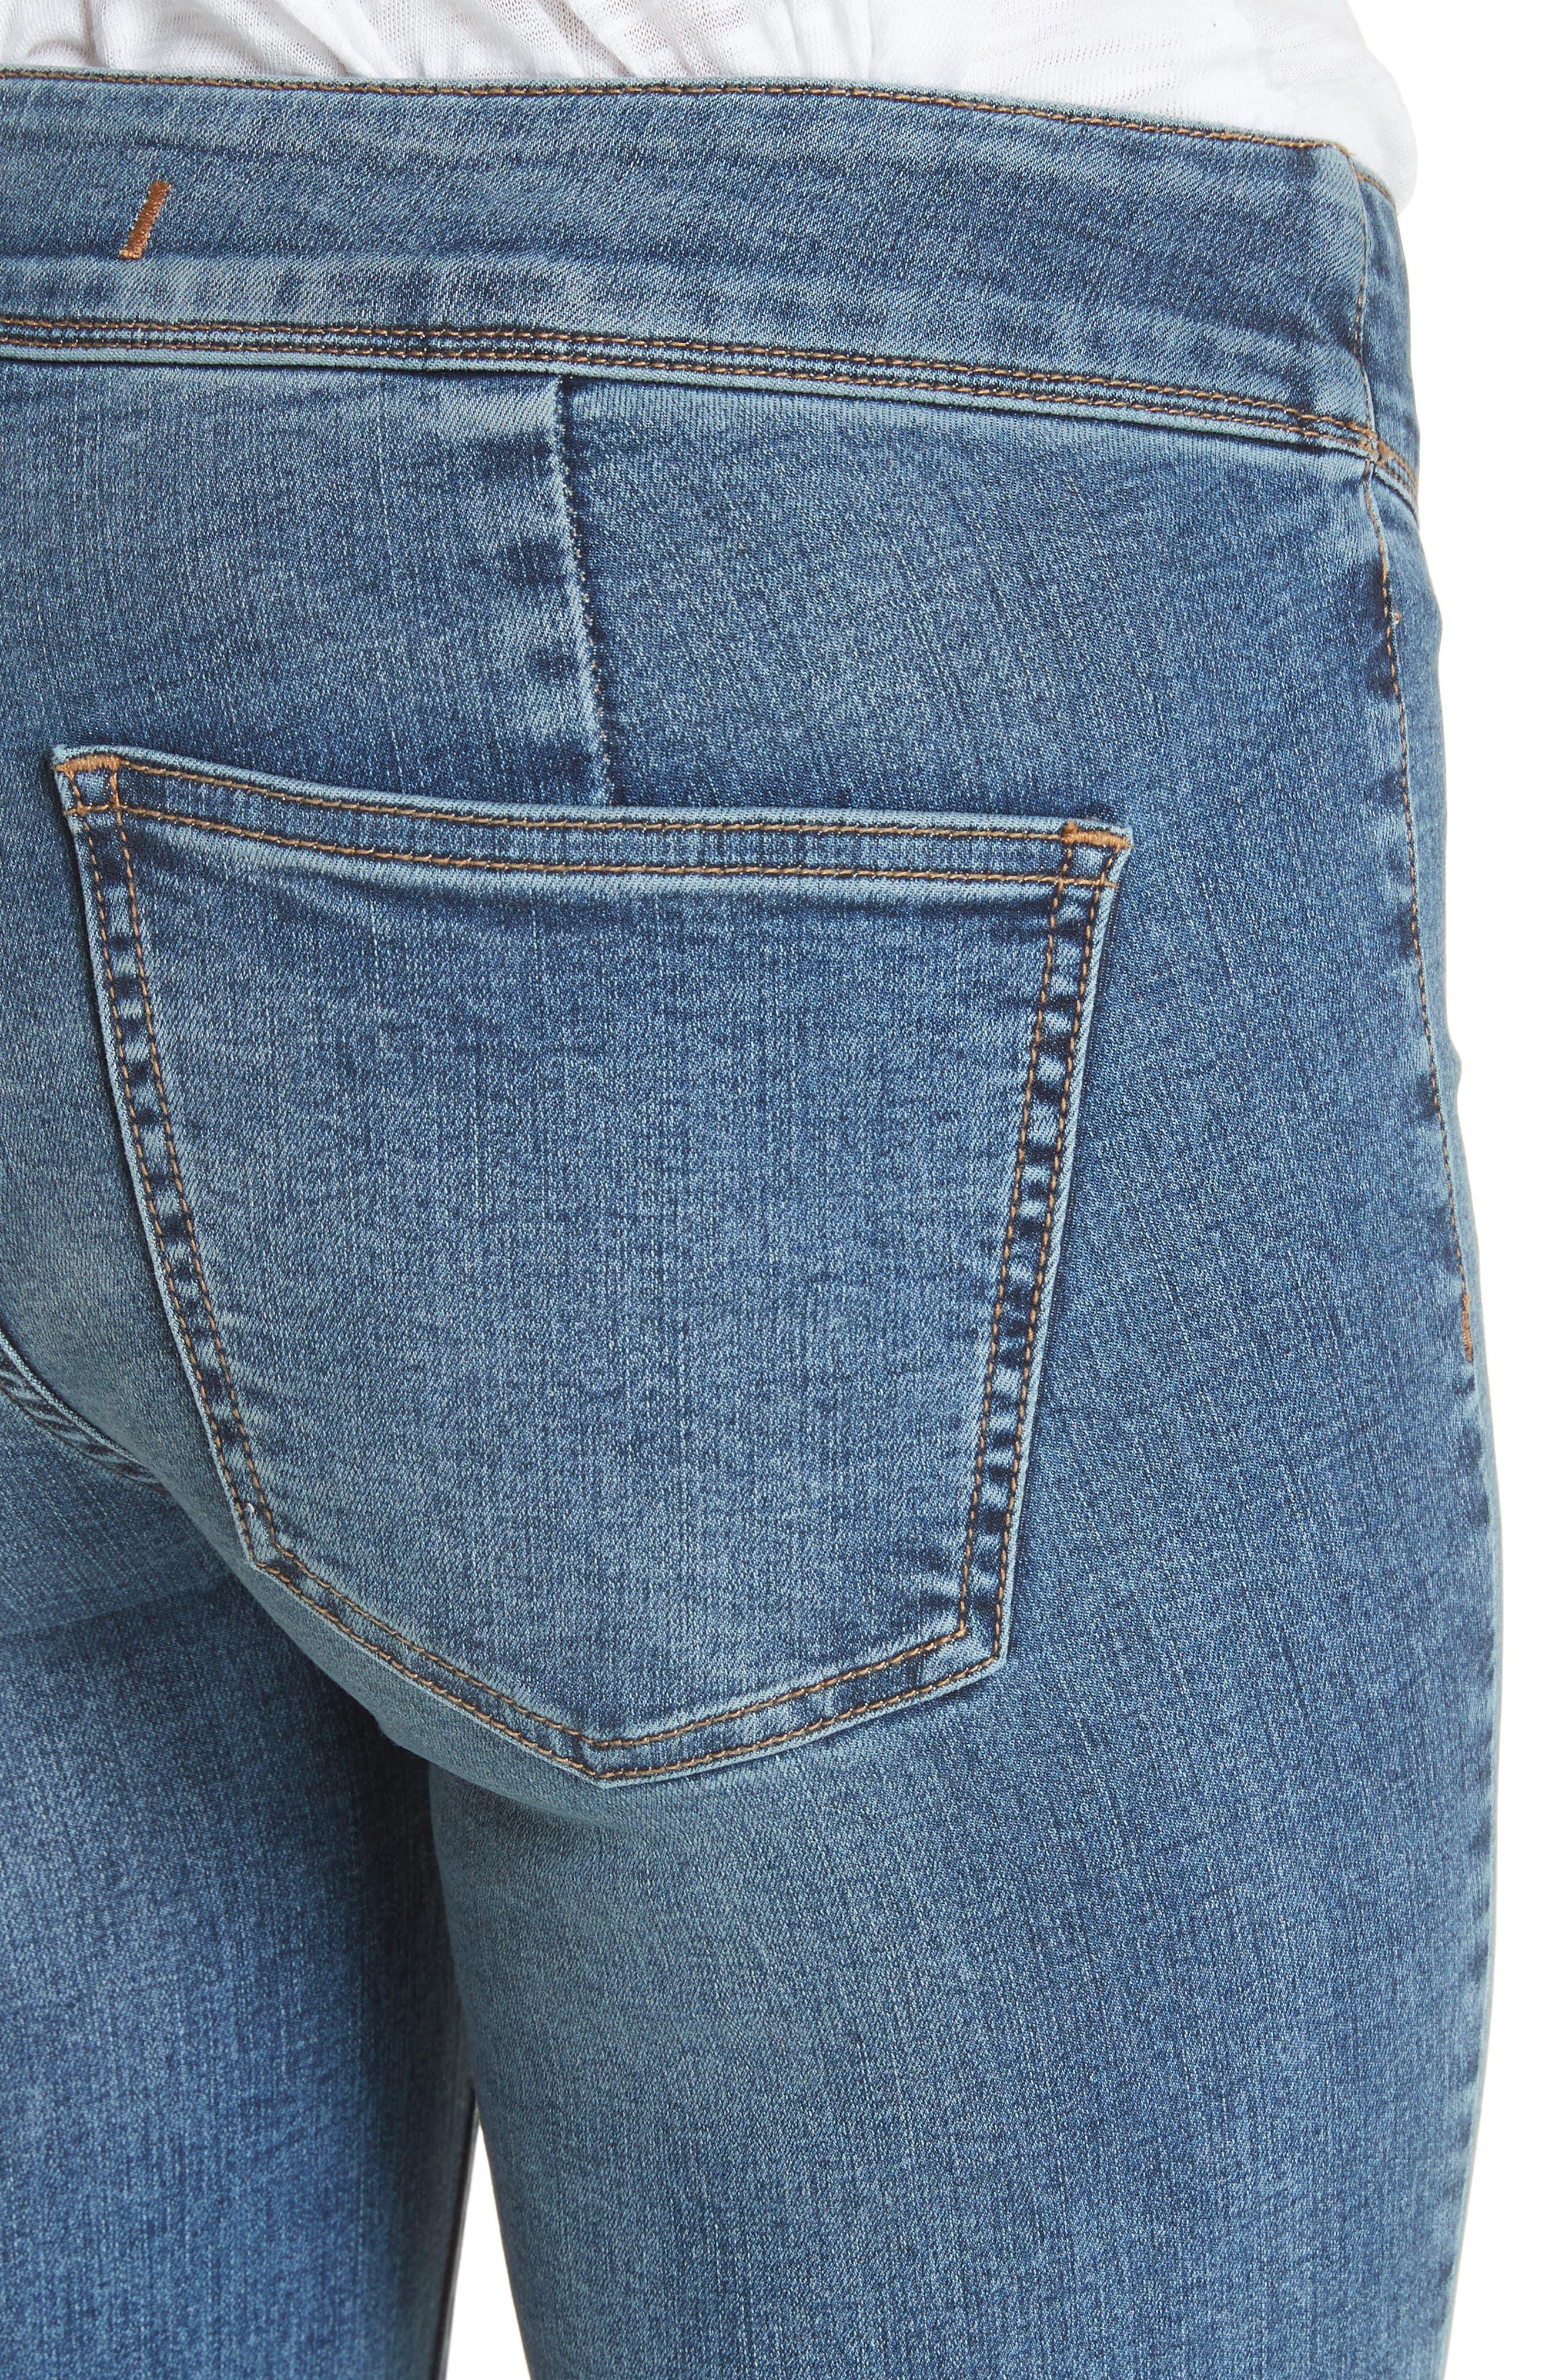 Flare Jeans,                             Alternate thumbnail 4, color,                             Blue